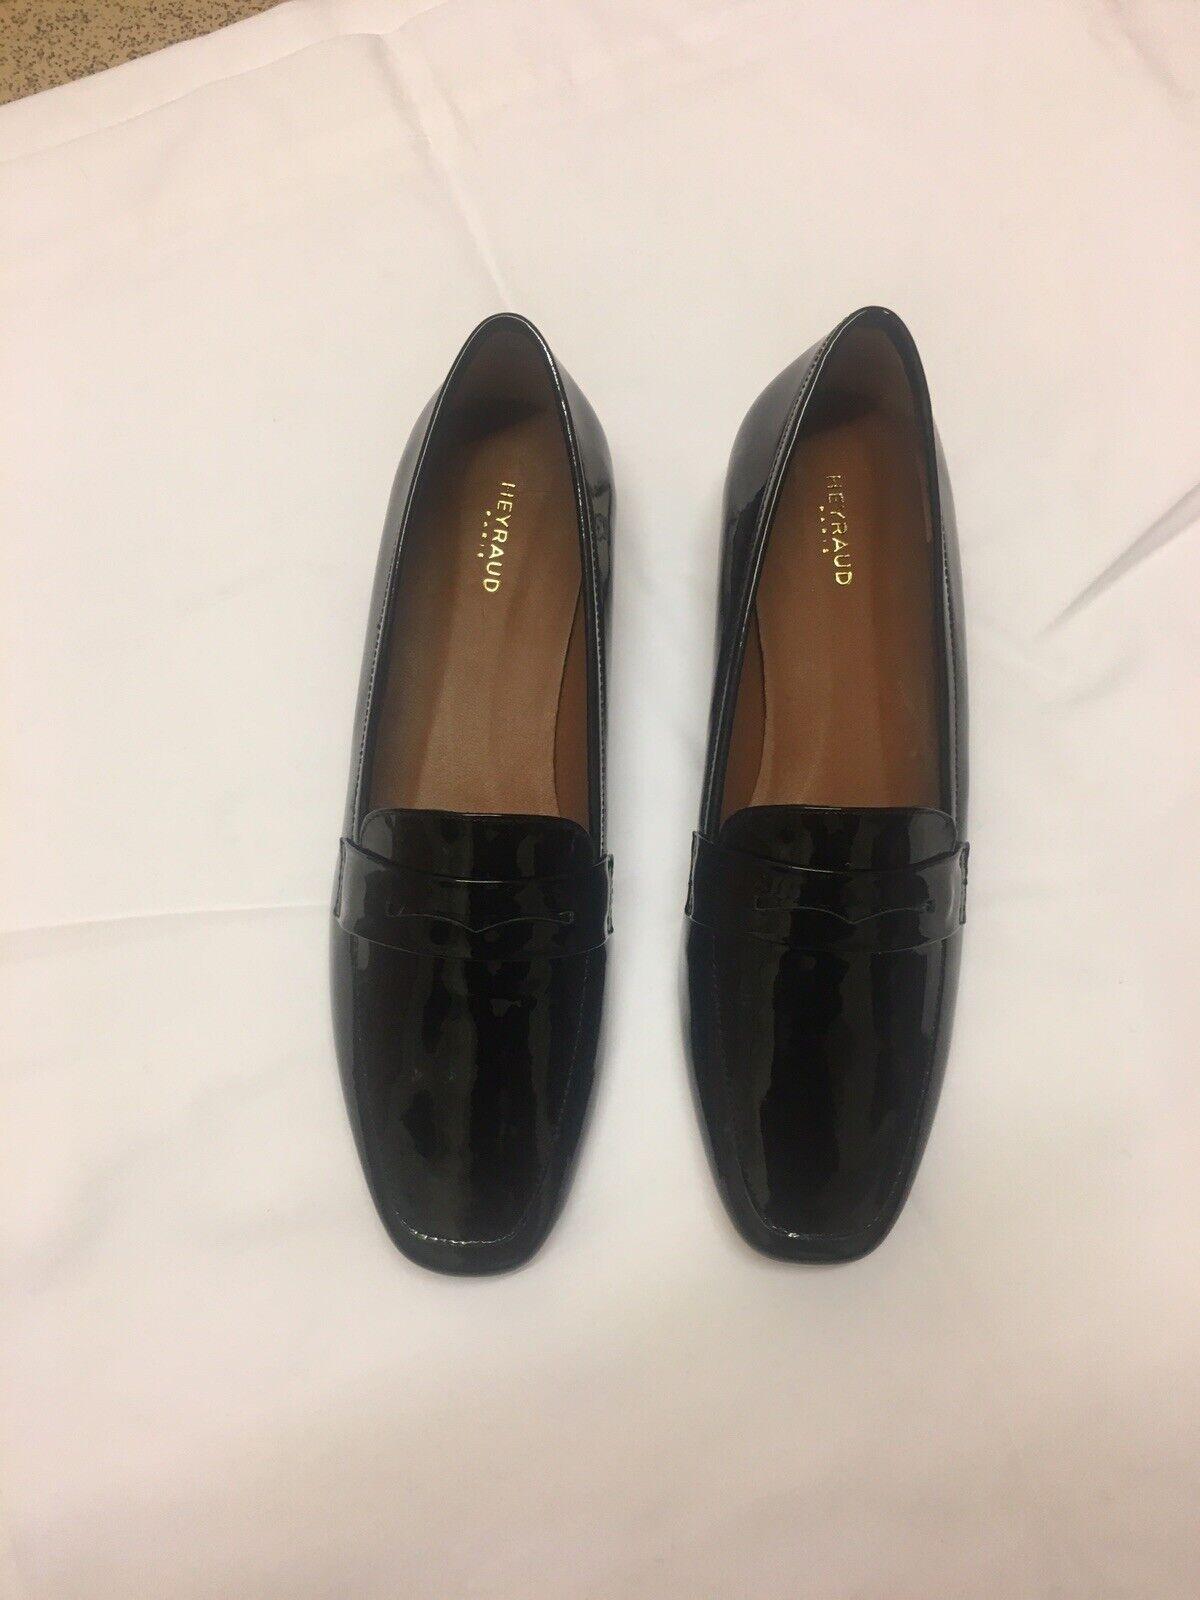 Da Donna Donna Nero Pelle loathers Taglia HEYRAUD Paris Moccasins scarpe